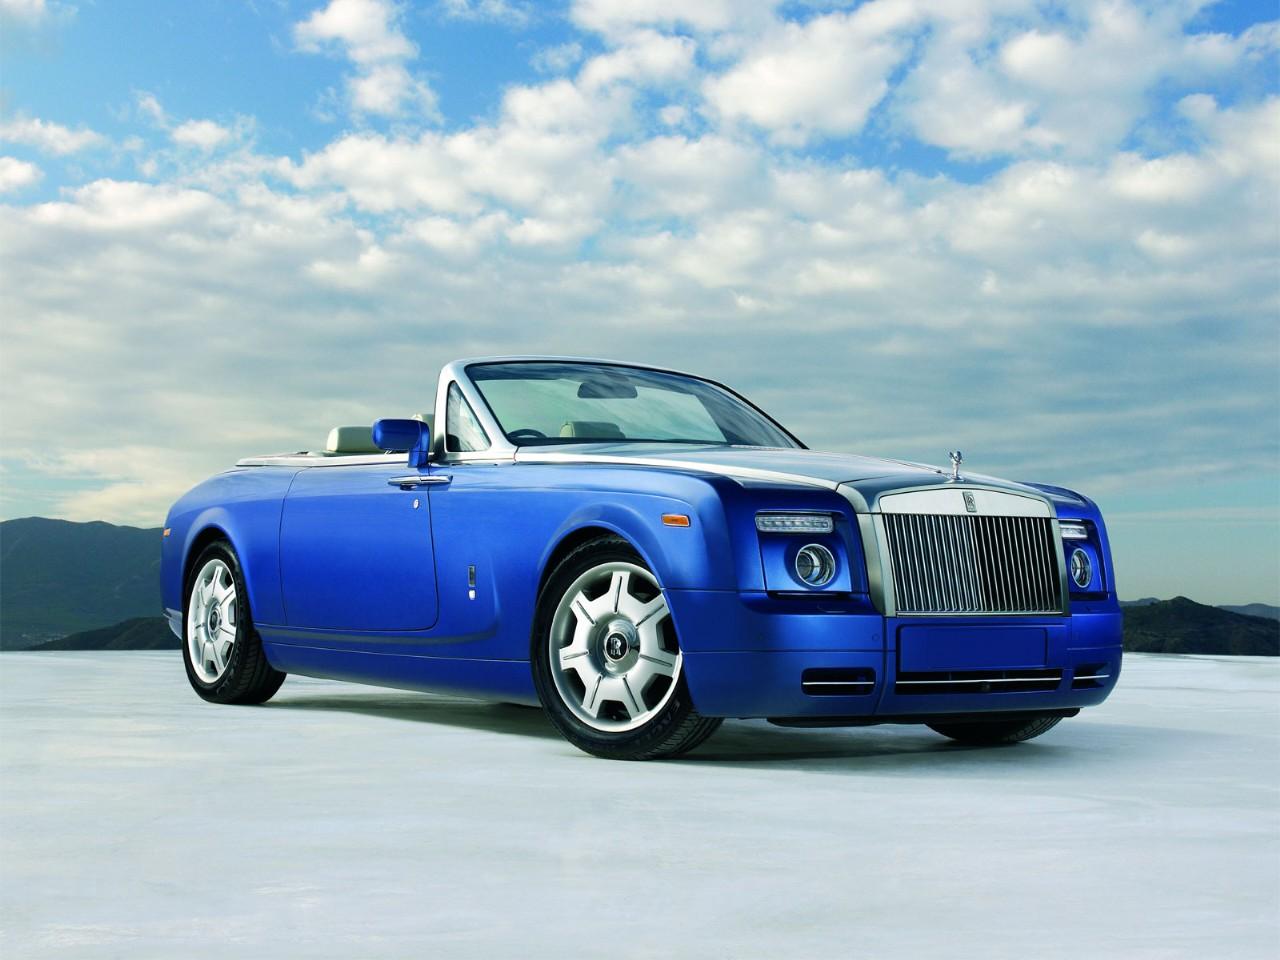 2007 Rolls-Royce Phantom Drophead